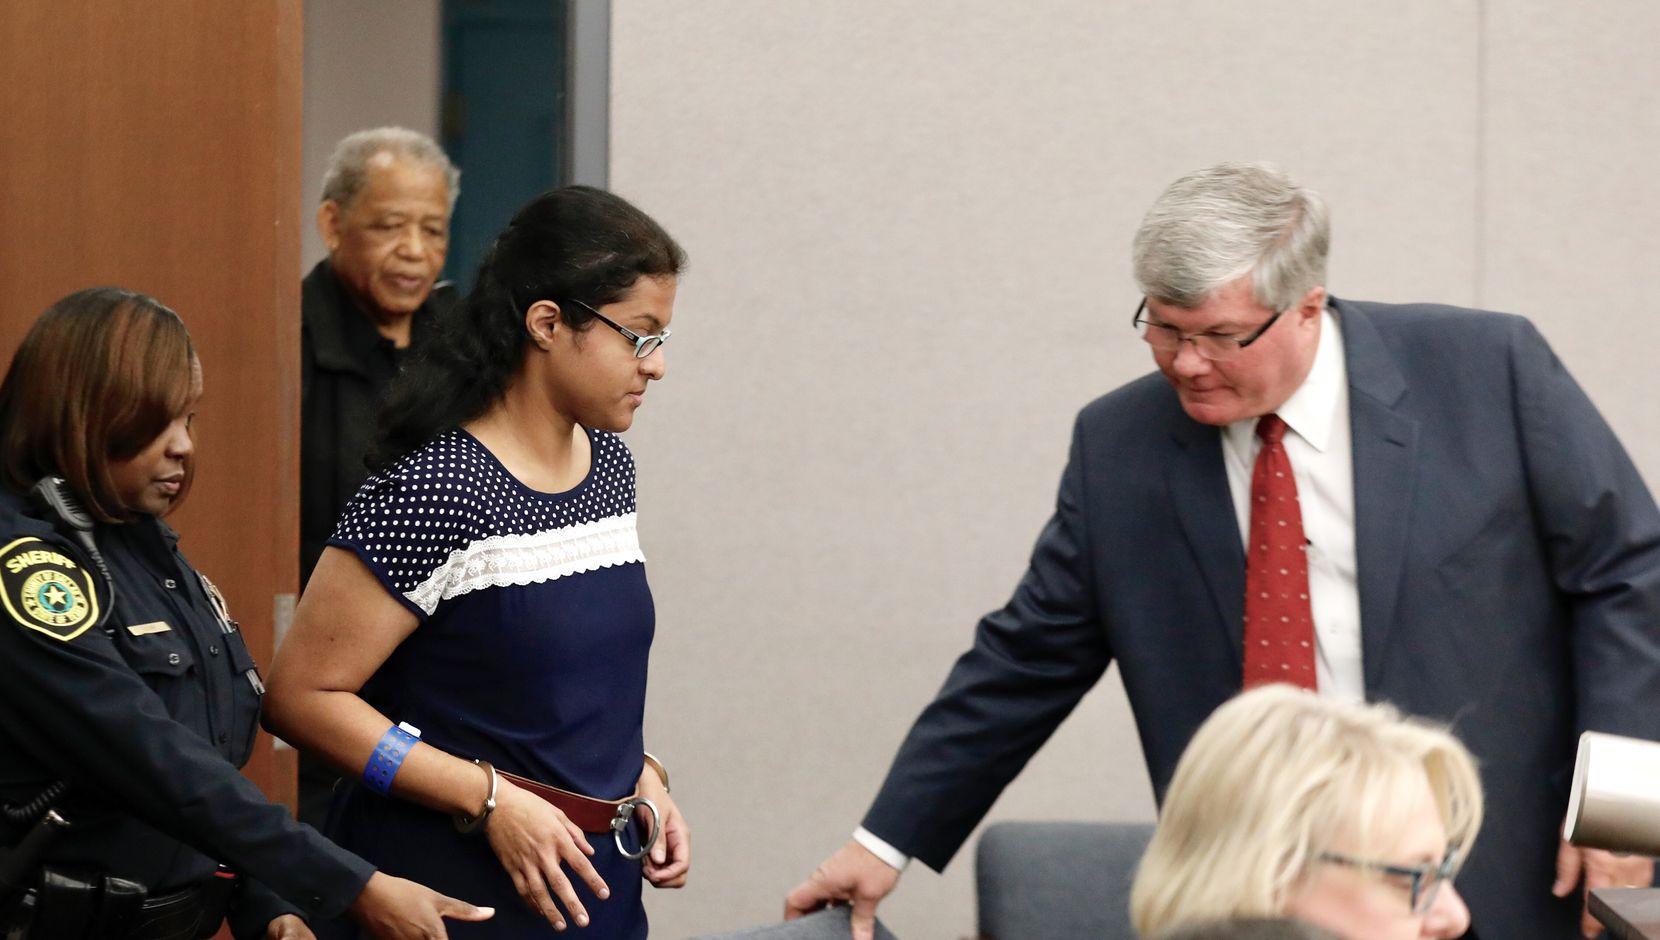 Sini Mathews, mother of Sherin Mathews, entered Judge Cheryl Lee Shannon's courtroom at the Henry Wade Juvenile Justice Building on Dec. 5, 2017.